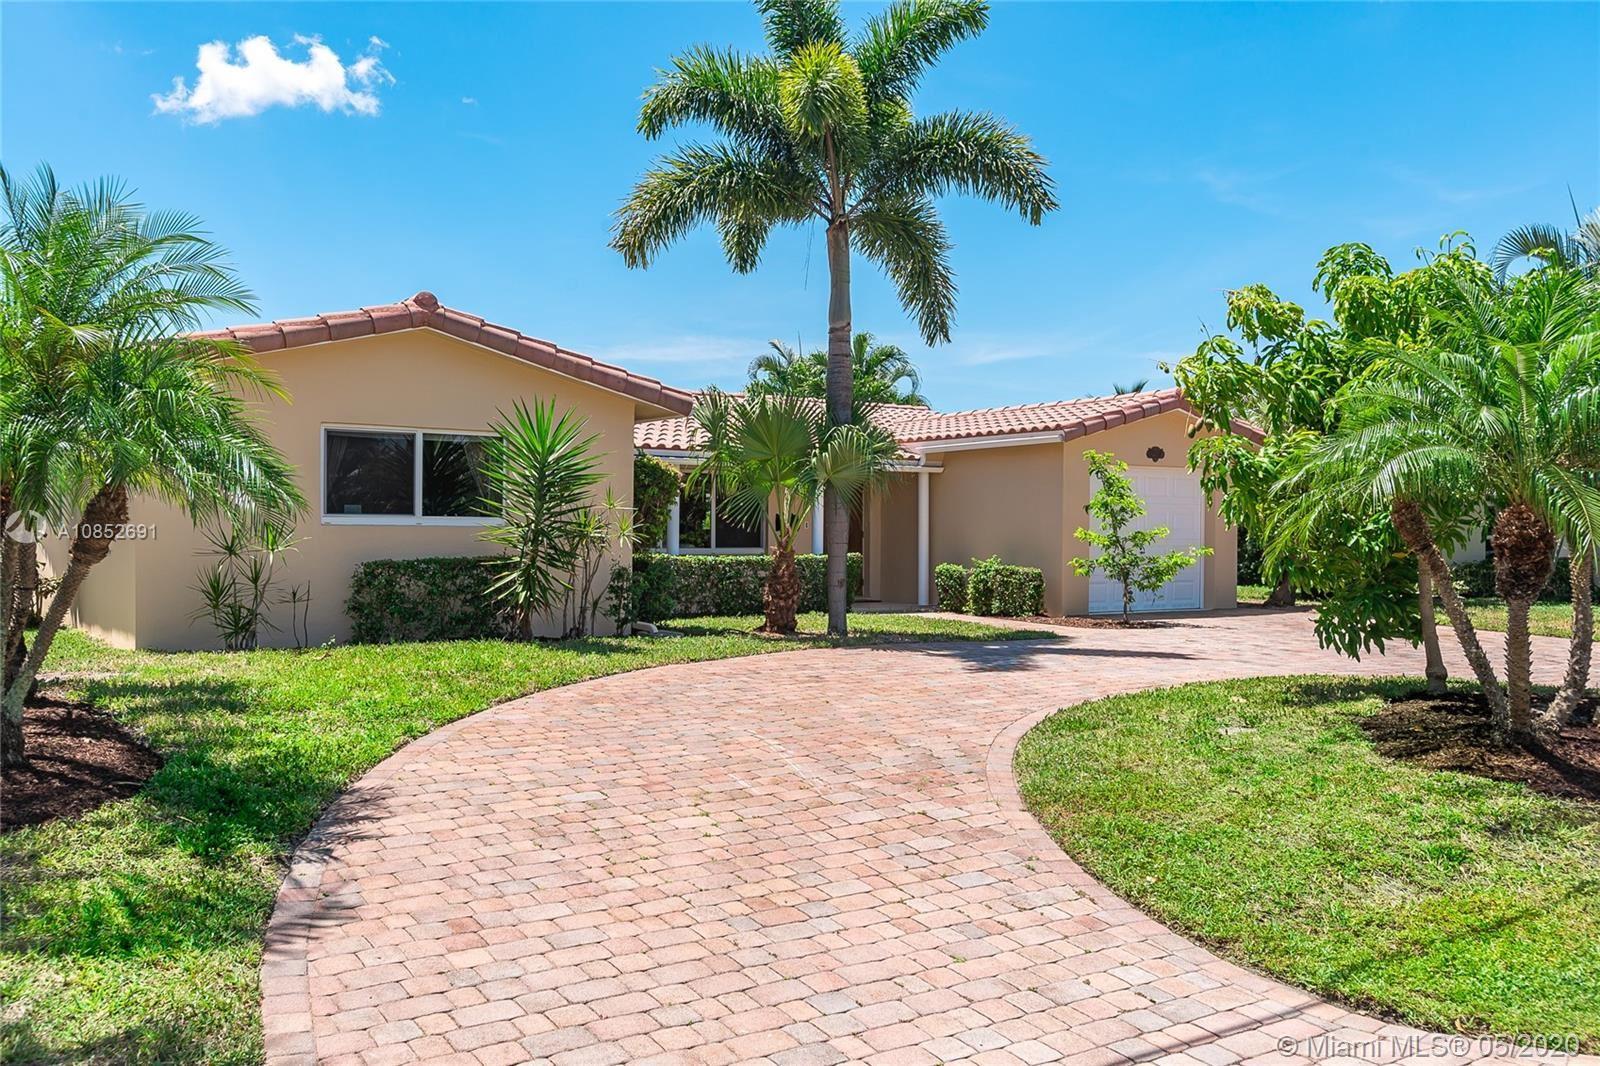 1472 NE 53rd Ct, Fort Lauderdale, FL 33334 - #: A10852691